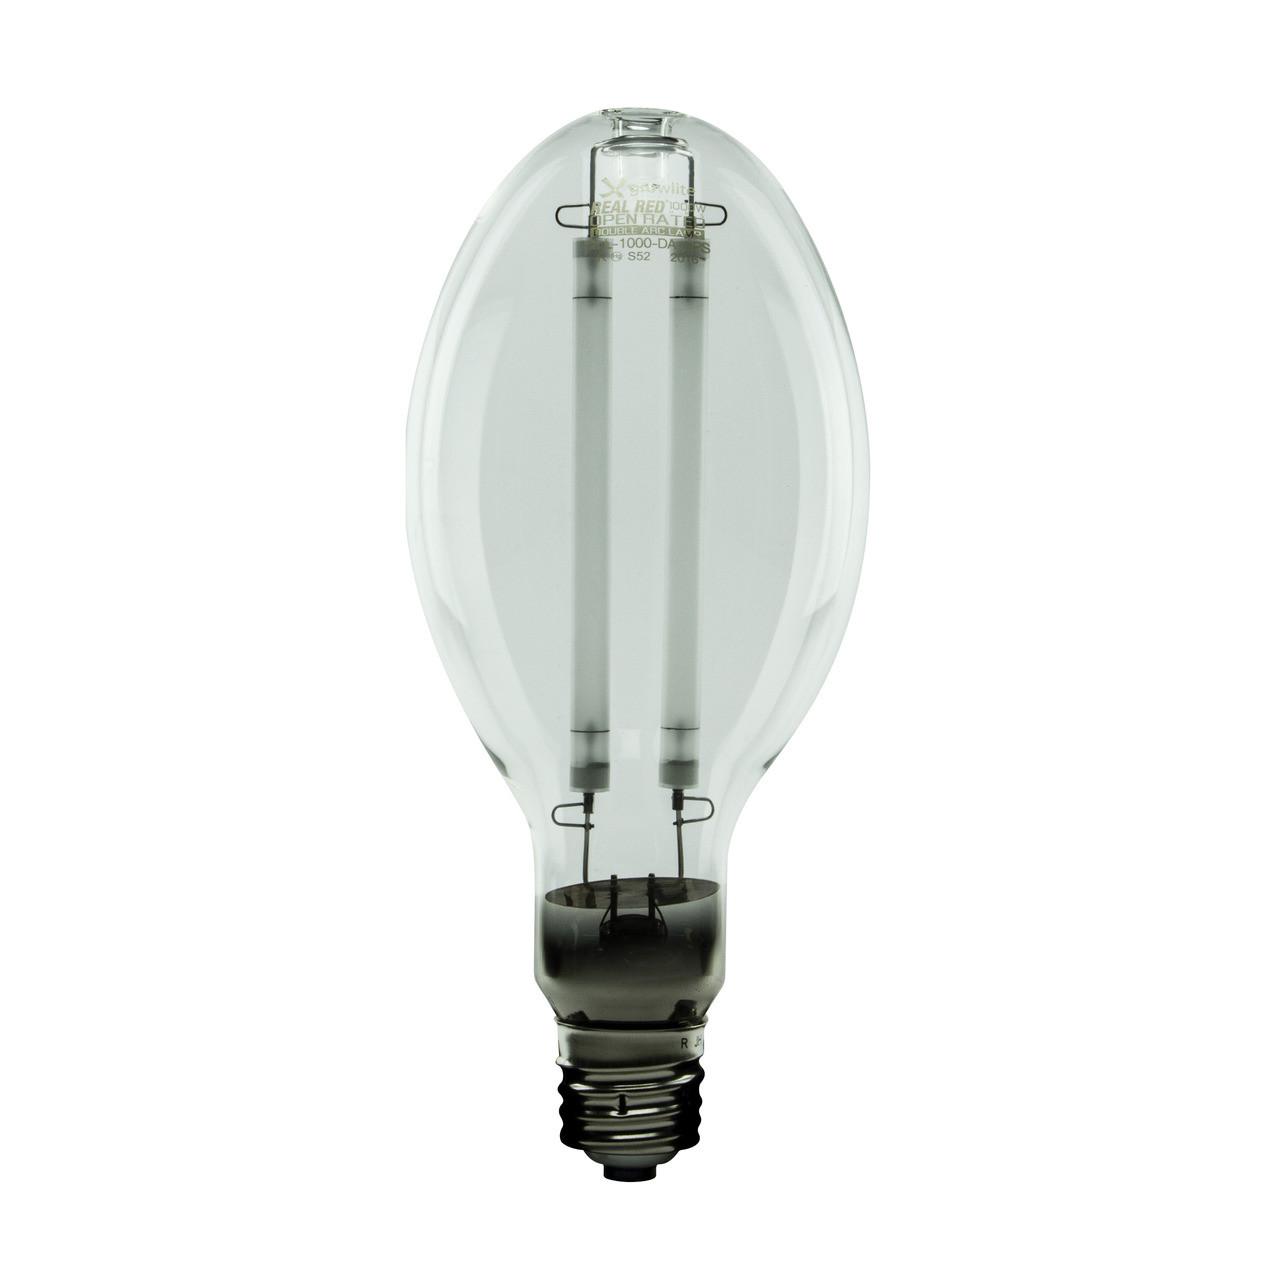 Real Red Mogul Base High Pressure Sodium 1000w Double Arc Growlite Fluorescent Light Bulb Diagram Lamp